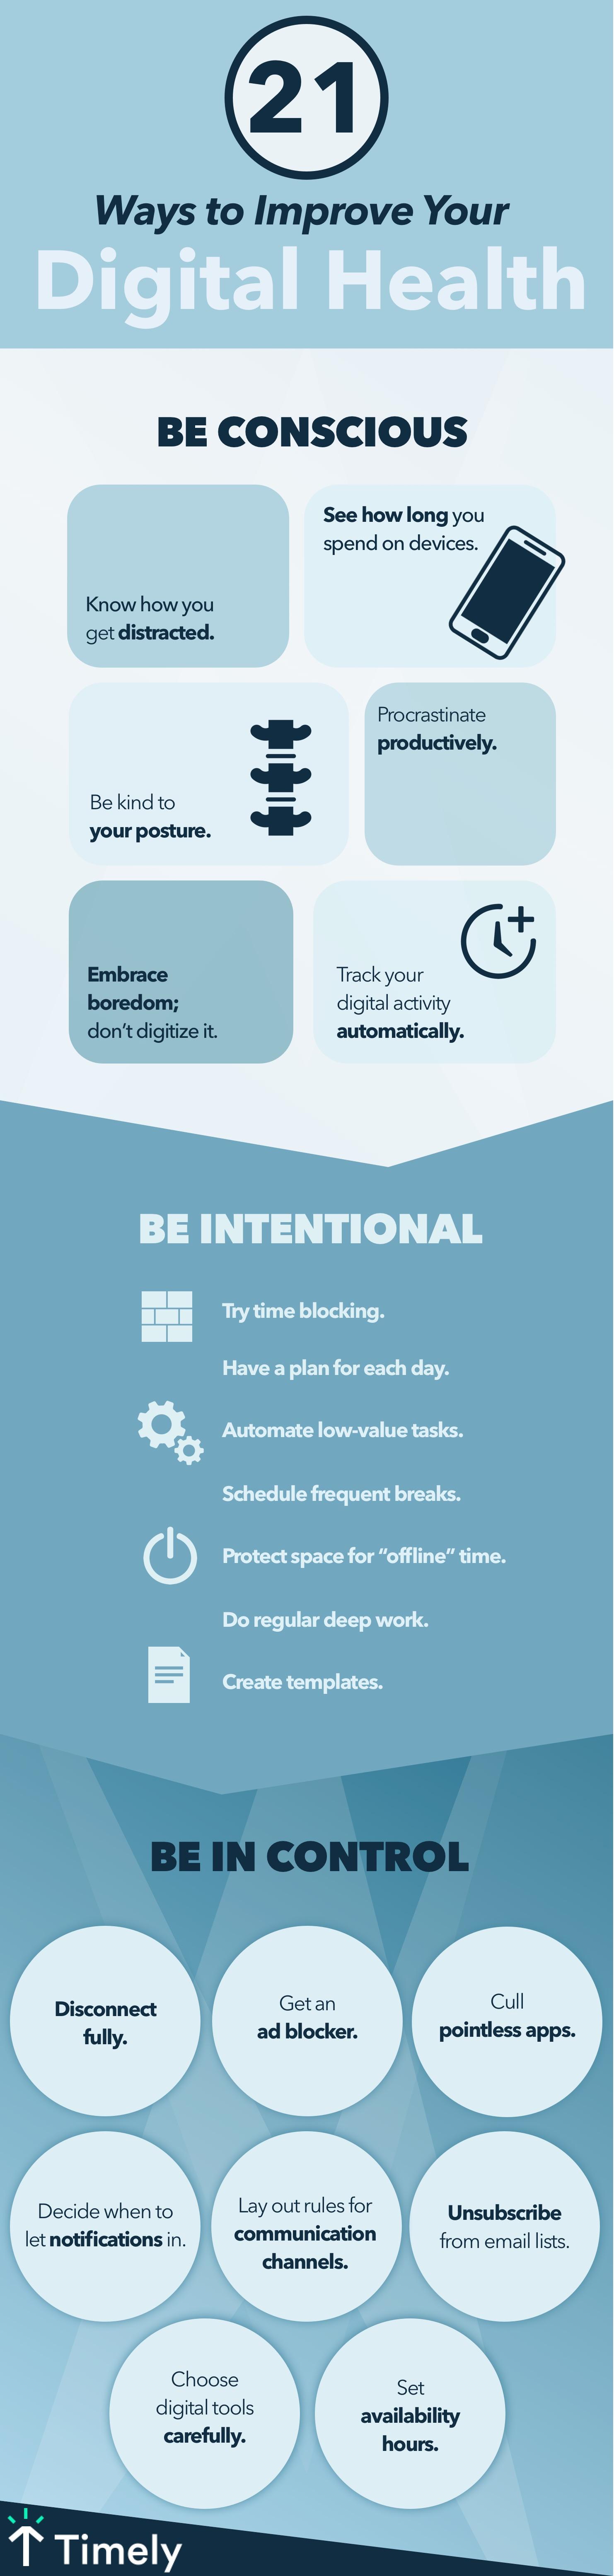 Improve-your-digital-health@2x